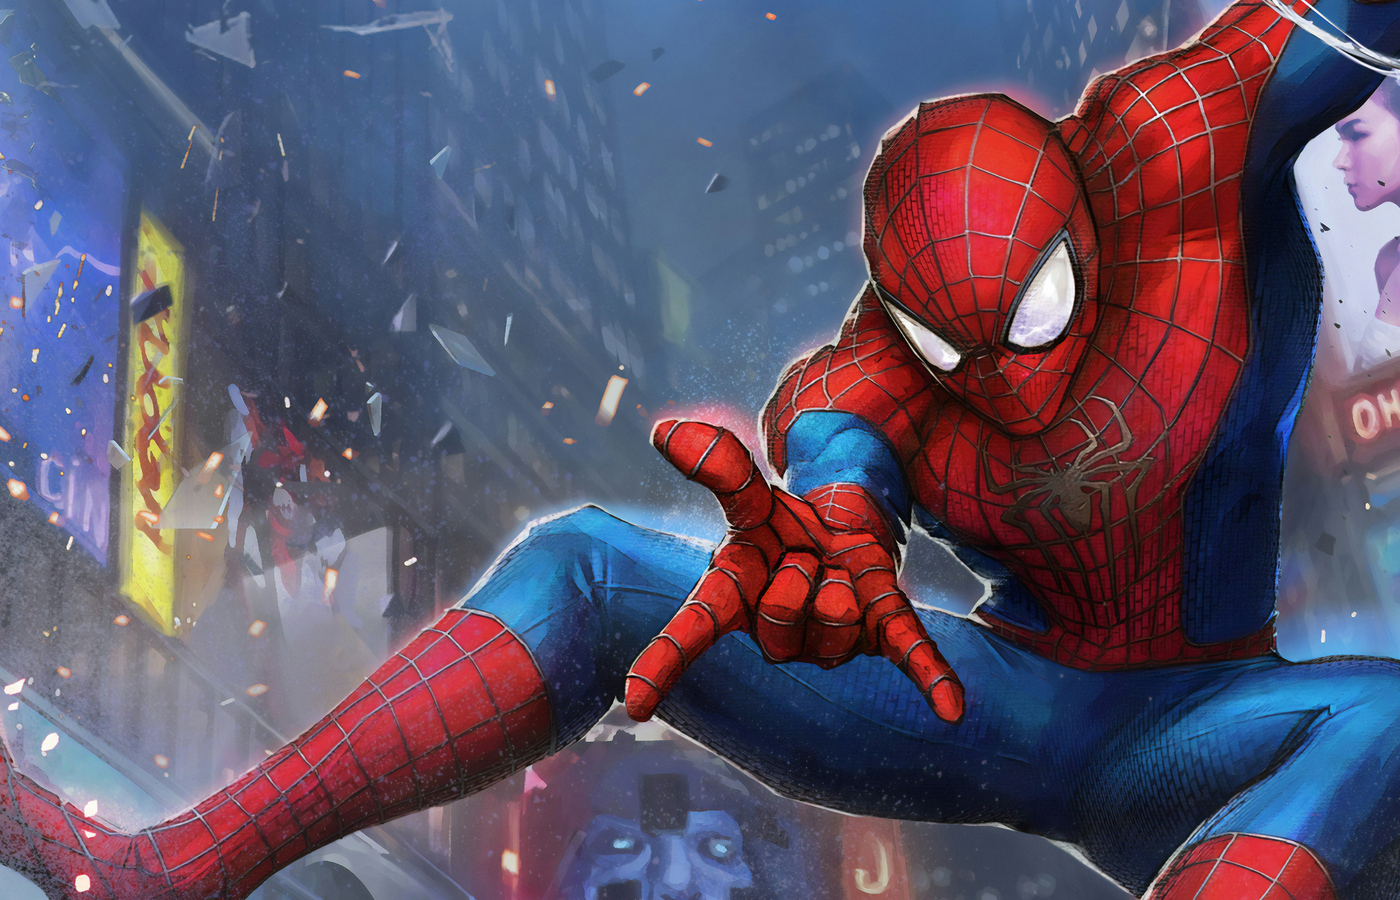 spiderman4kart-12.jpg